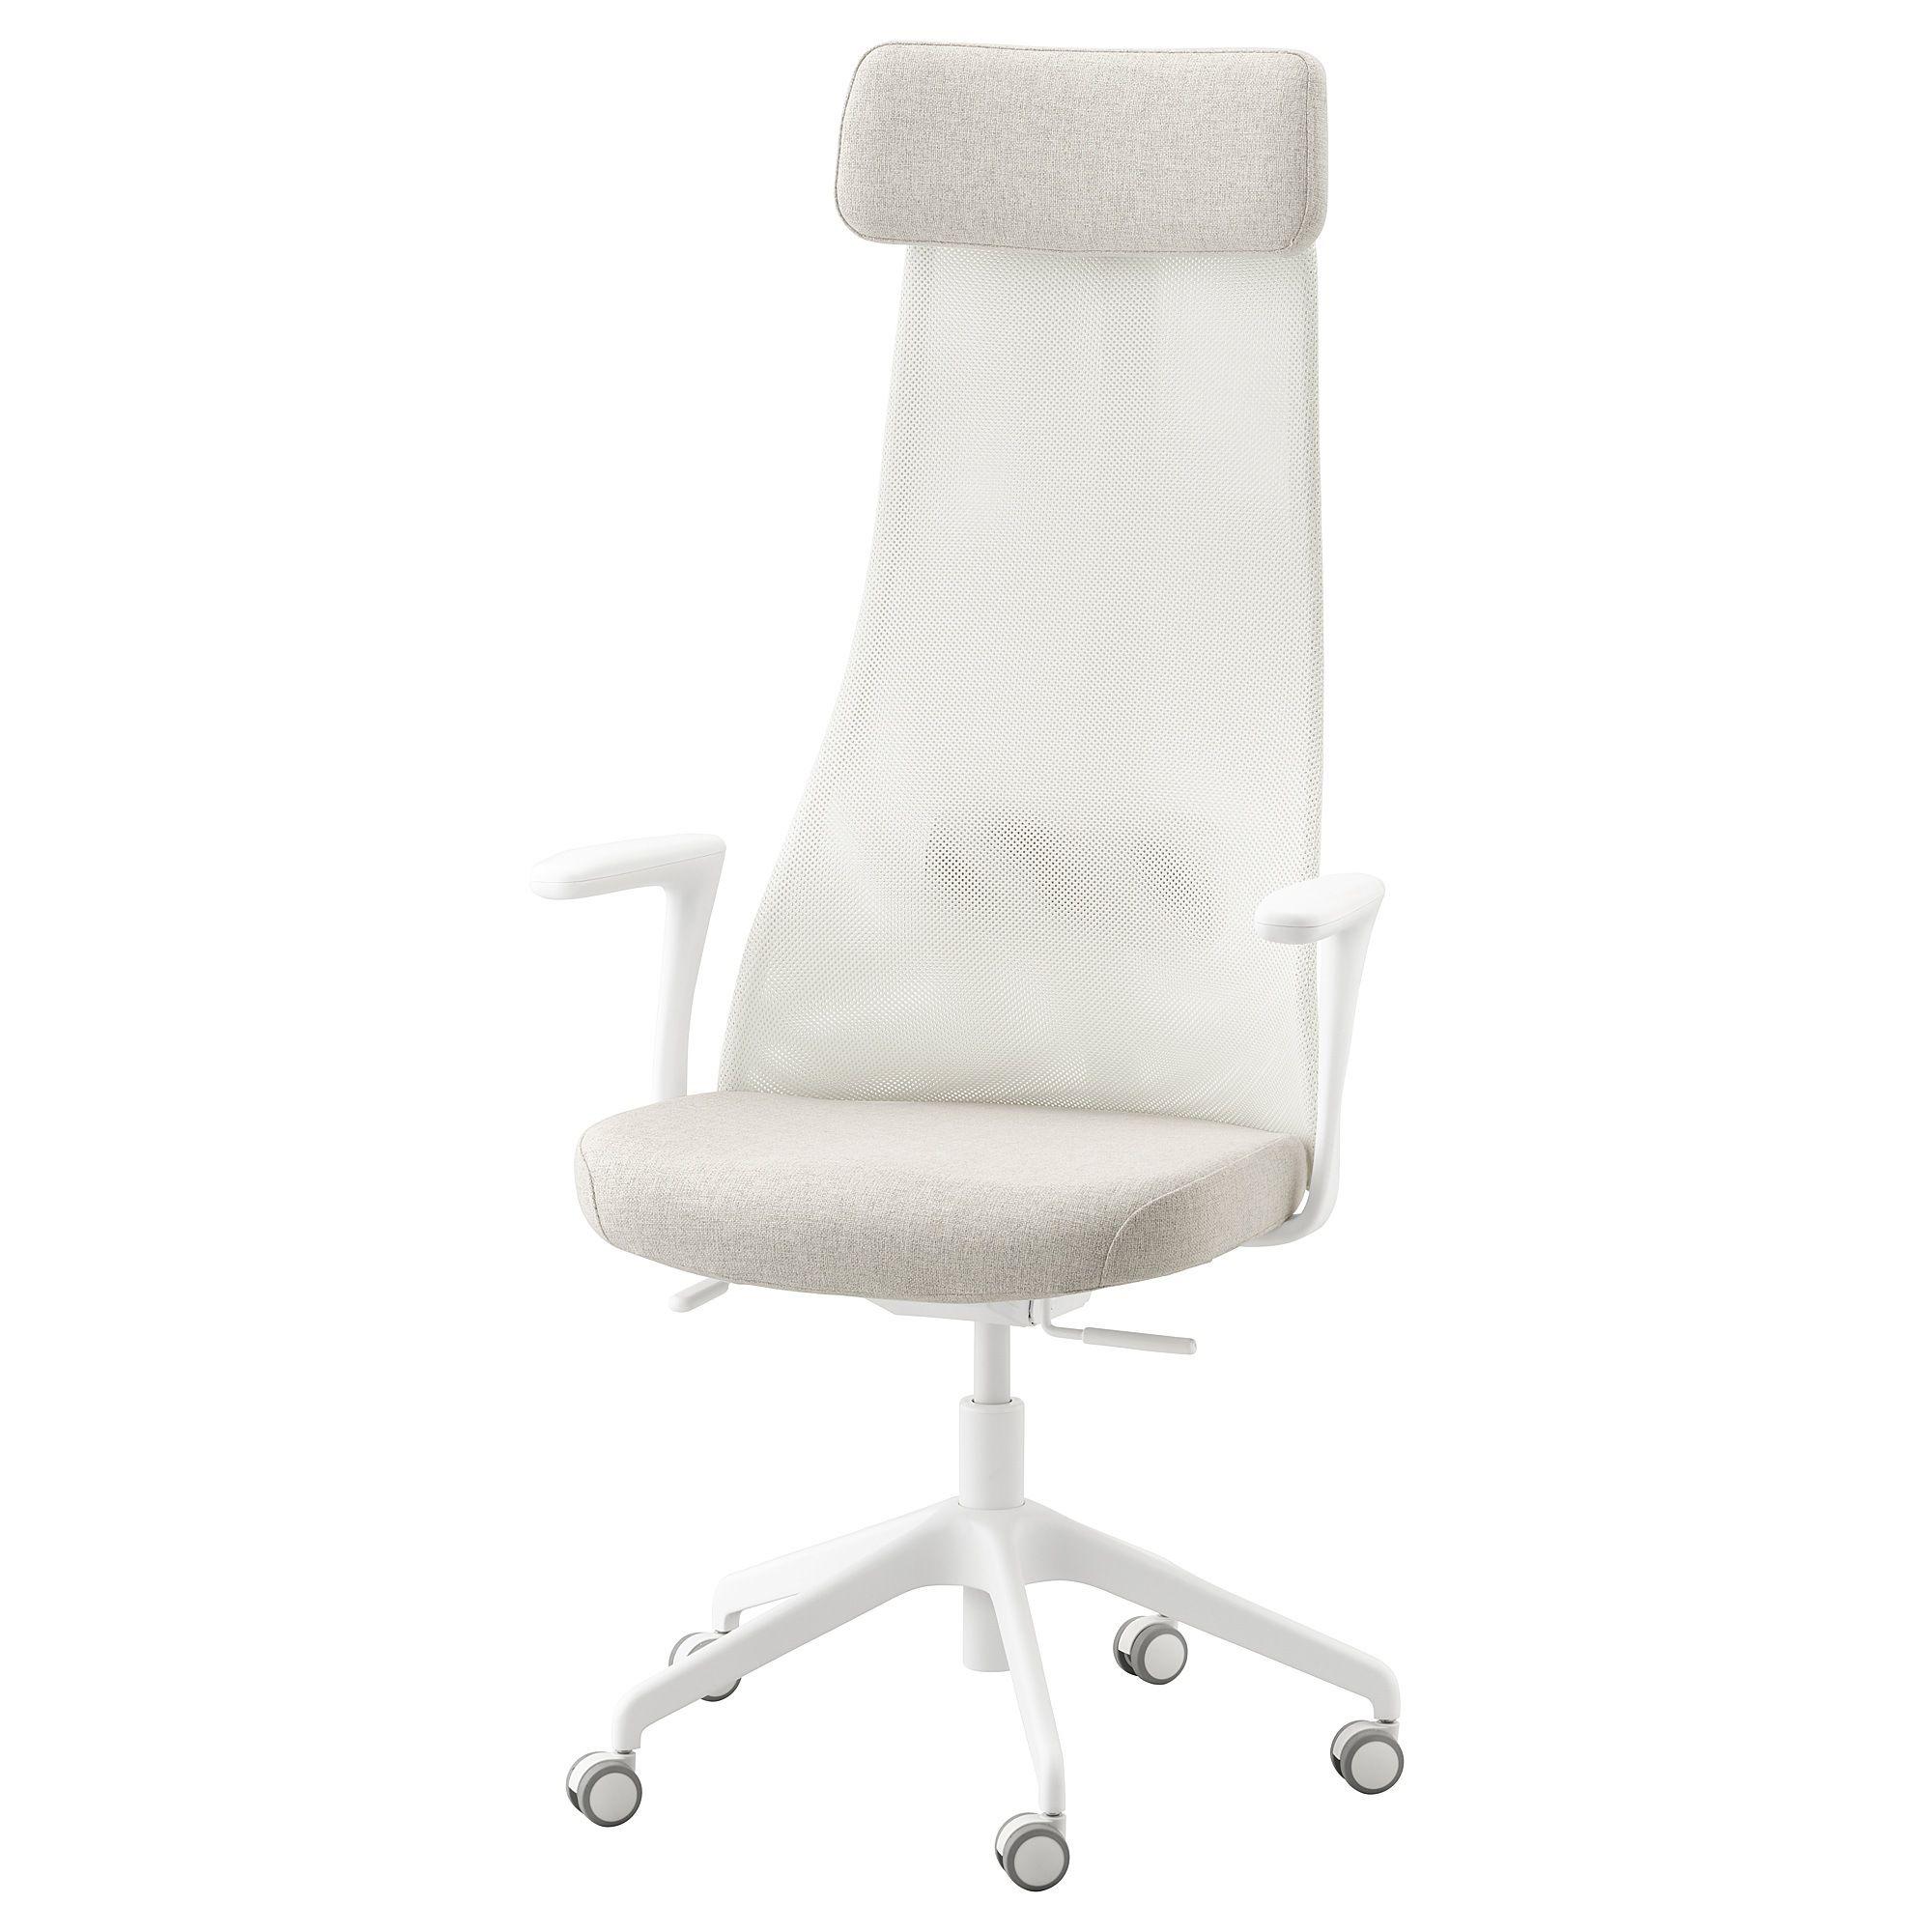 JÄRVFJÄLLET Office chair with armrests - Gunnared beige/white